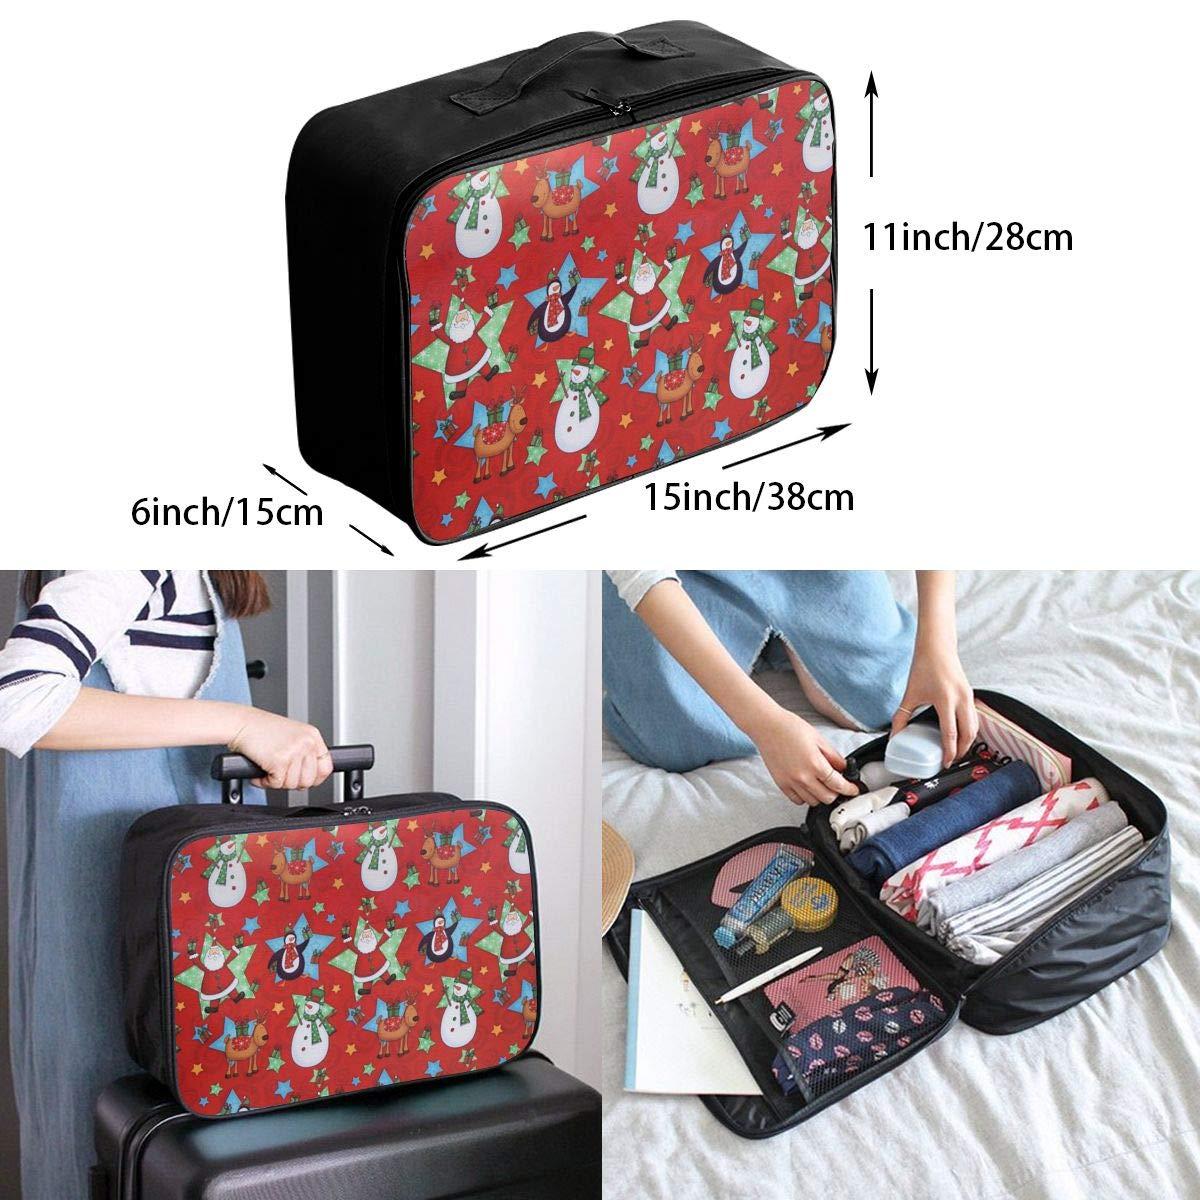 YueLJB Christmas Santa Claus Penguins Lightweight Large Capacity Portable Luggage Bag Travel Duffel Bag Storage Carry Luggage Duffle Tote Bag